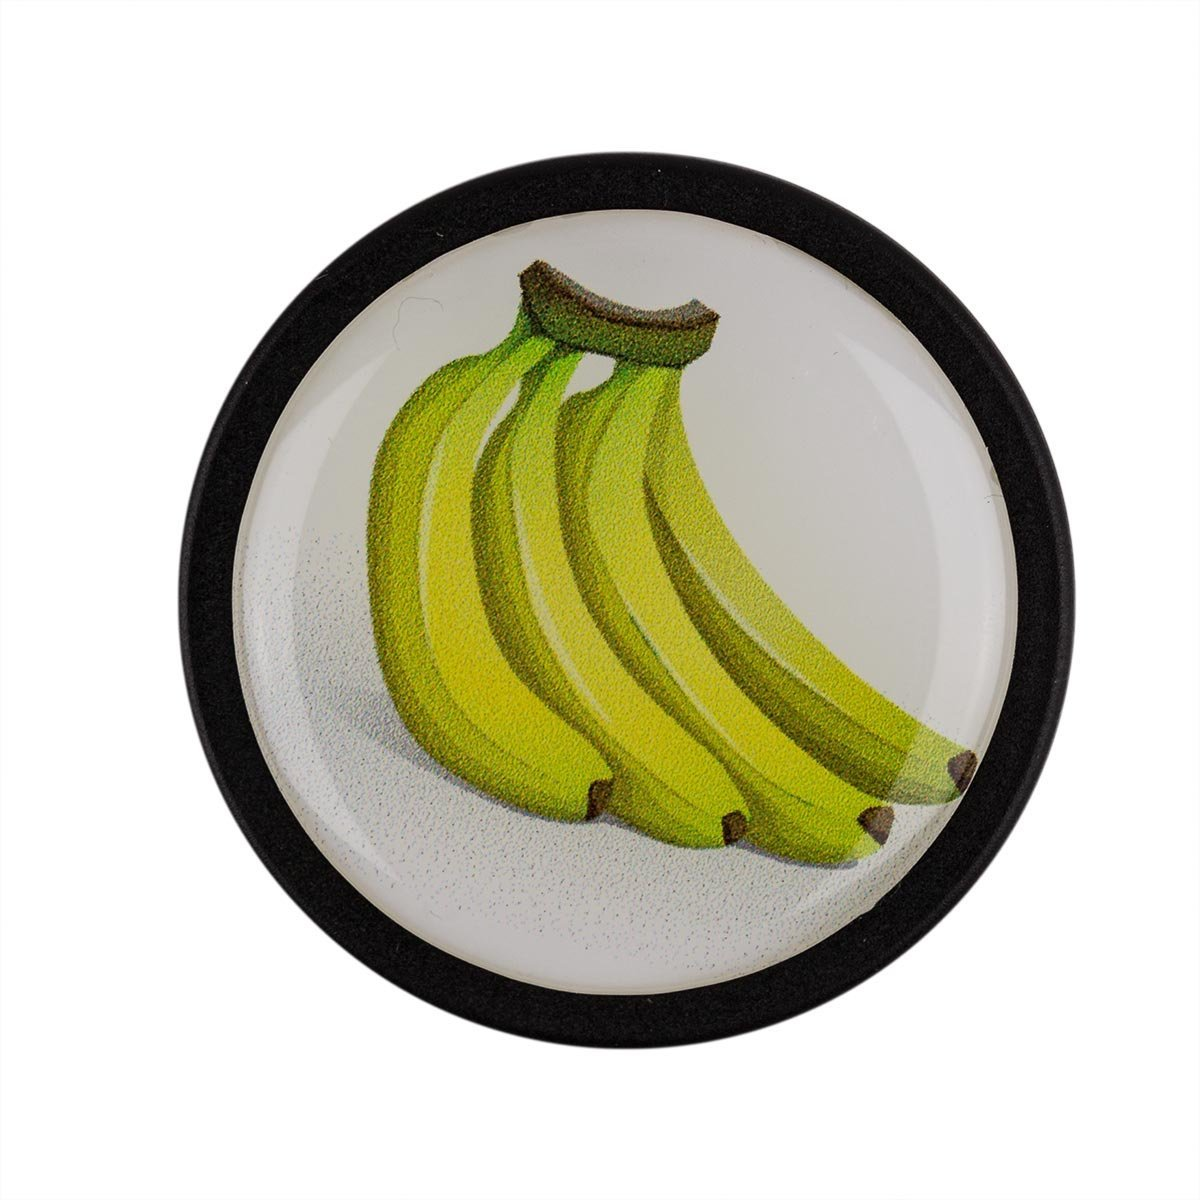 Imanes k4 K _ 35 - 8 Plátanos Negro - Whiteboard, Combi, Oficina ...